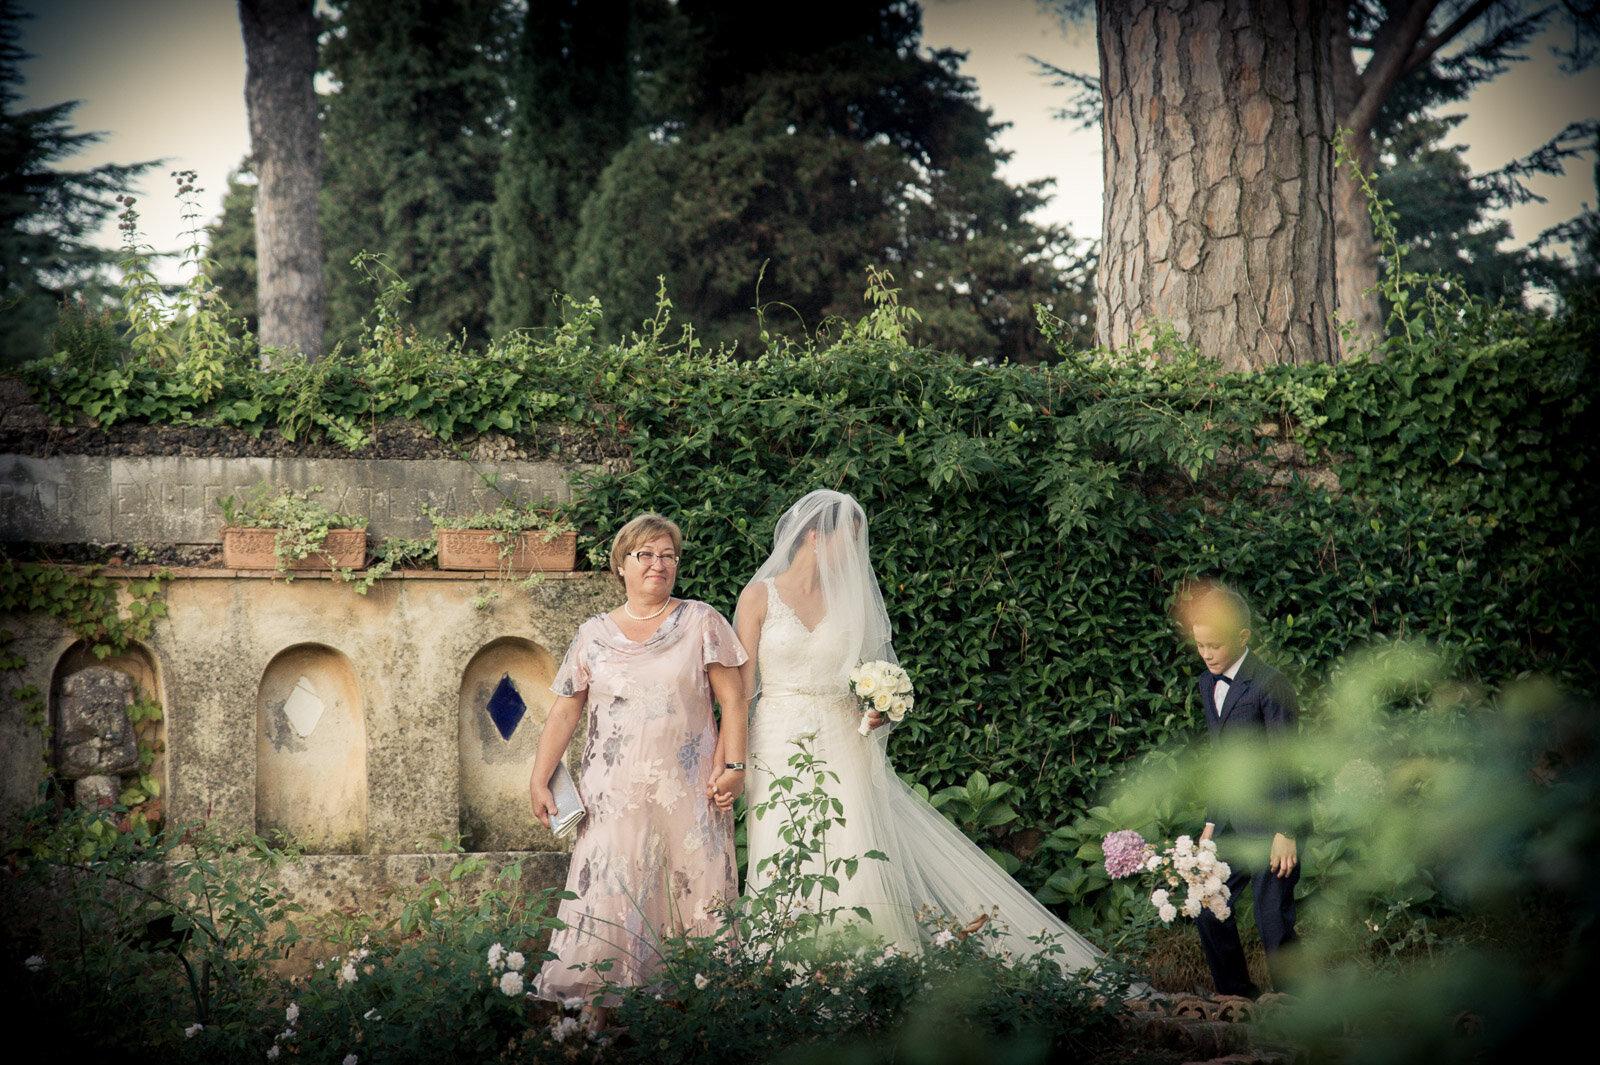 Russian Wedding in Villa Cimbrone Costiera Amalfitana 11.jpg